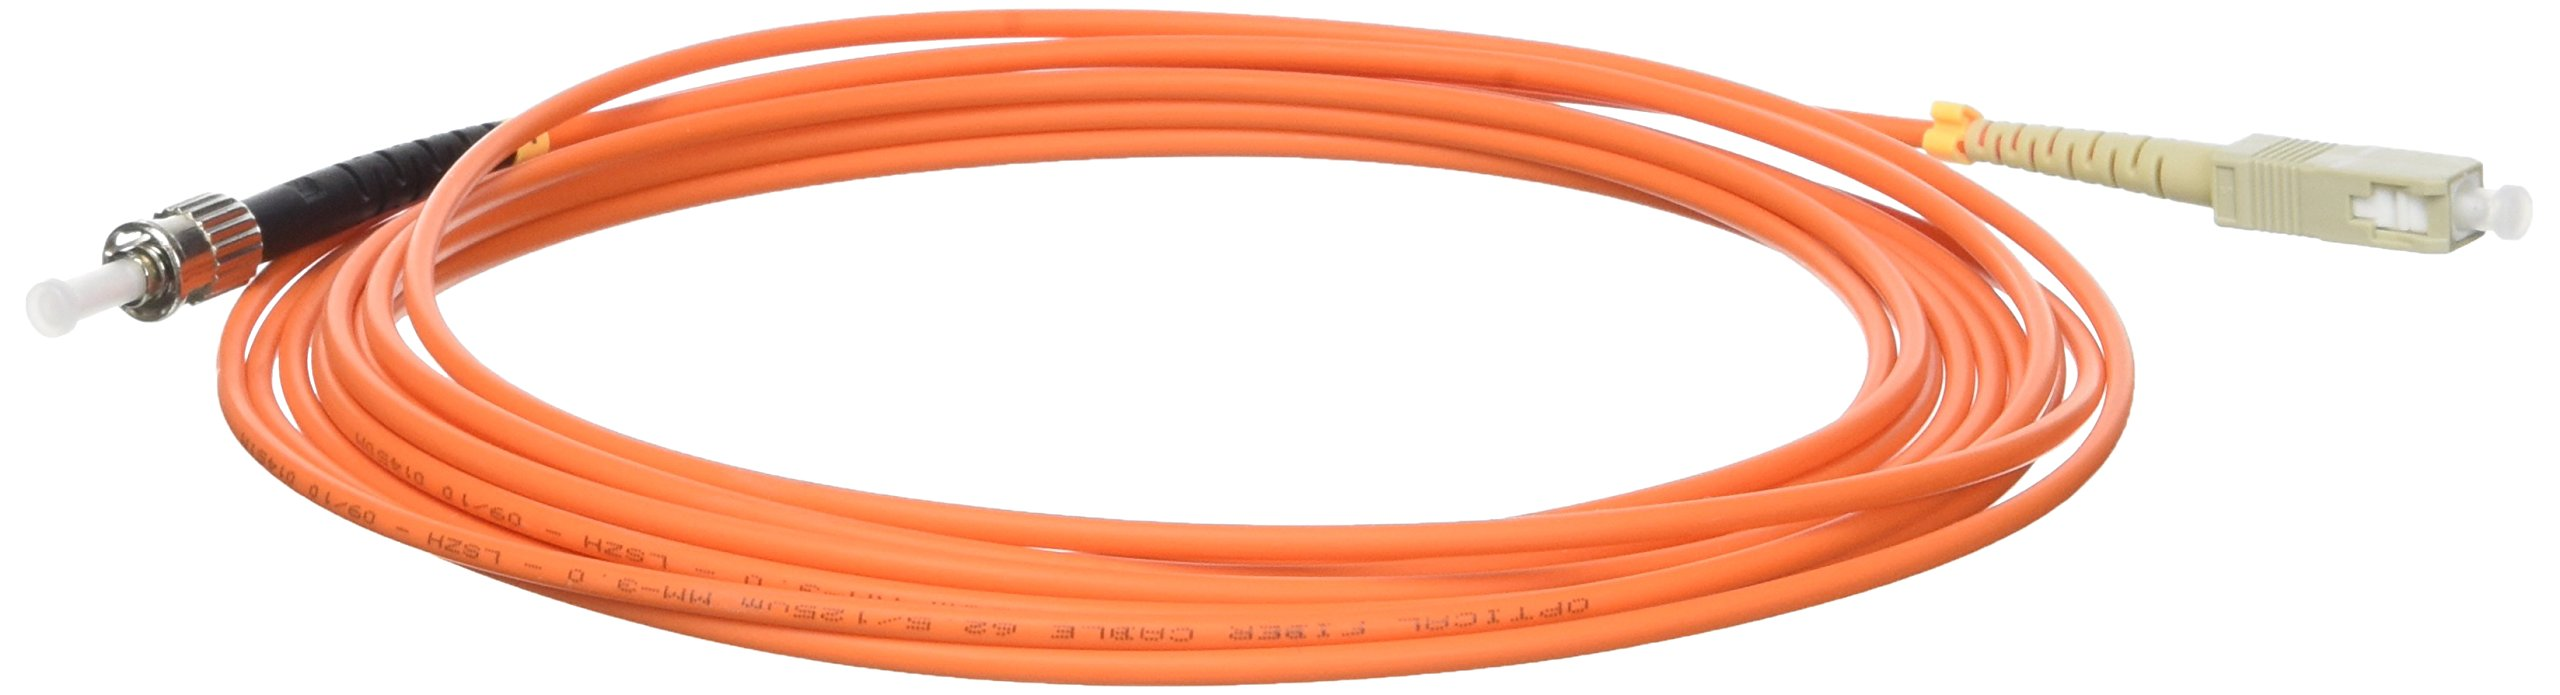 Cablematic - Cable de fibra óptica ST a SC multimodo simplex 62.5/125 de 5 m